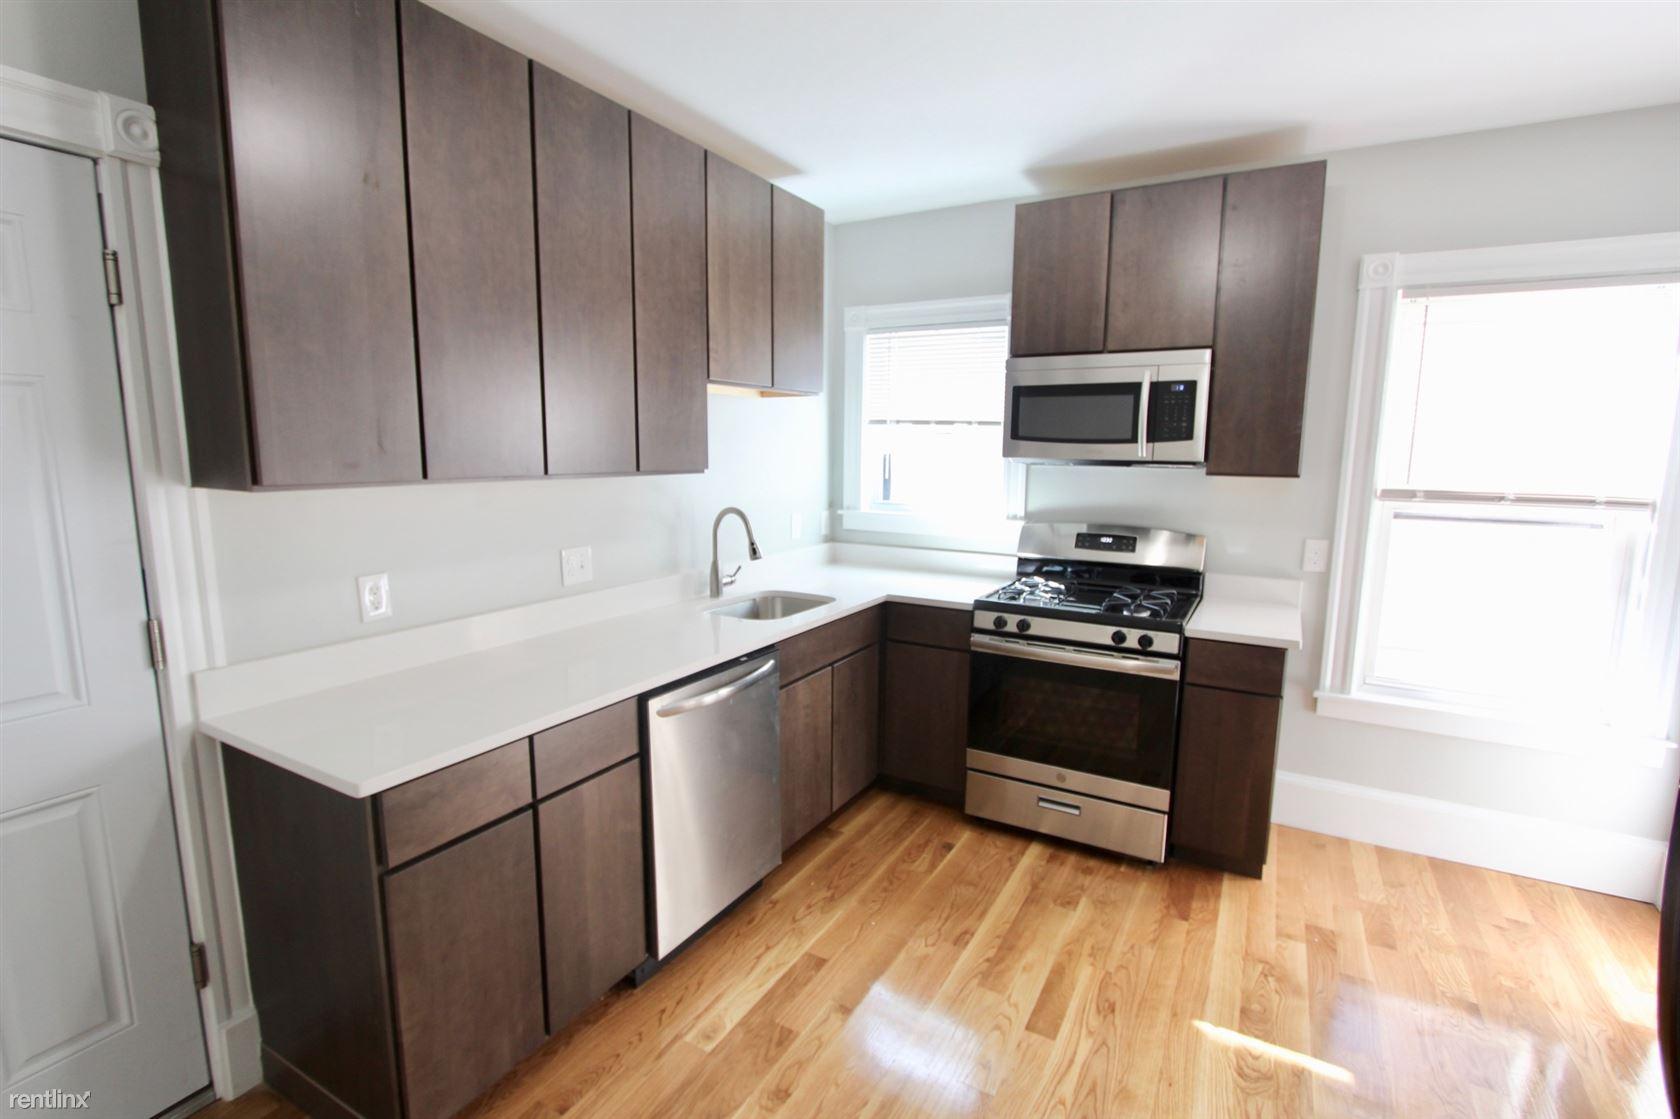 34 Russell St Apt 3, Malden, MA - $3,200